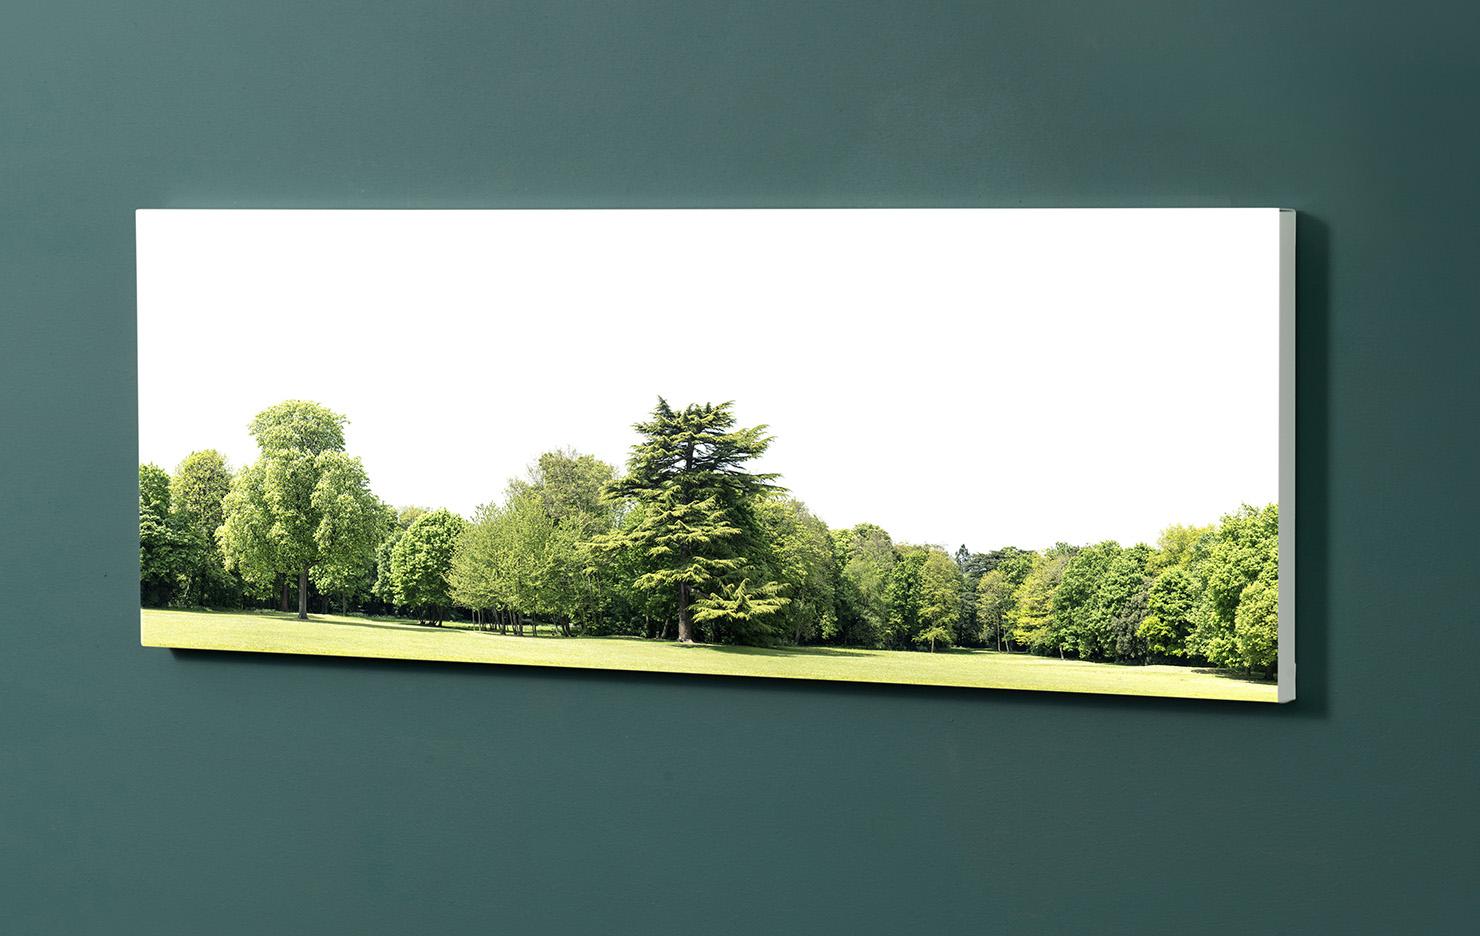 Magnettafel NOTIZ 90x30cm Motiv-Pinnwand M147 Wald